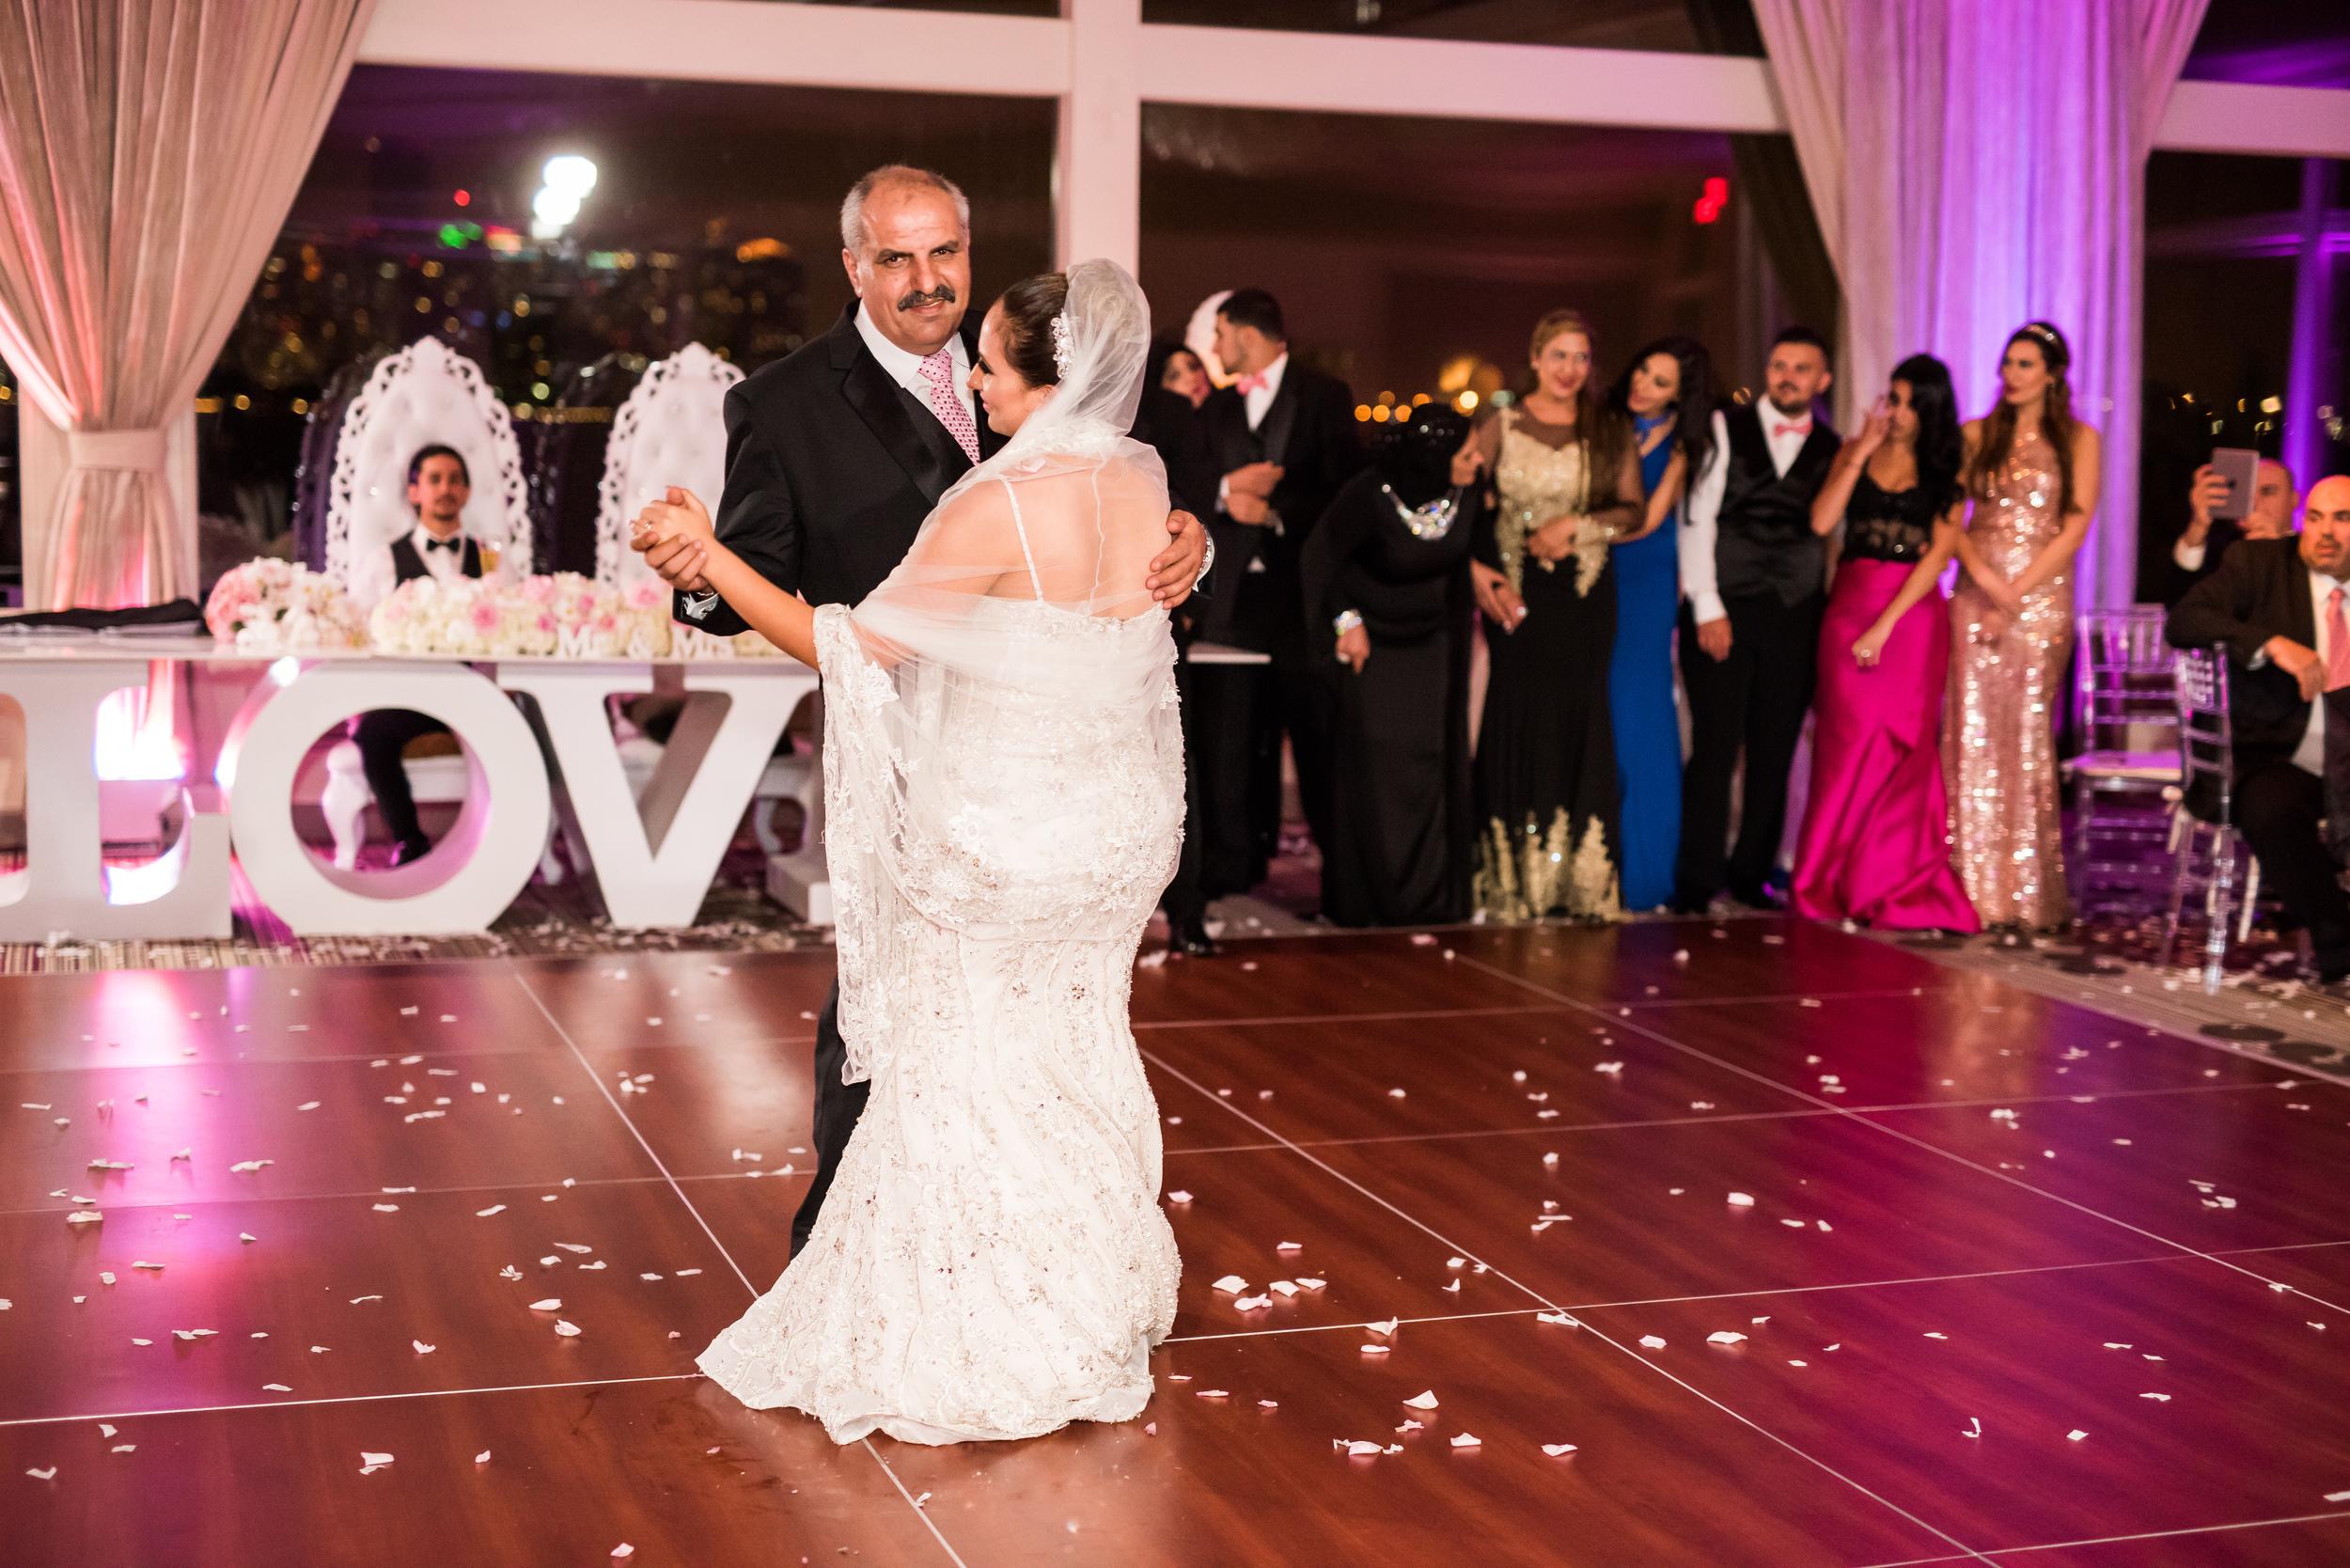 Suzannes & Omar's Wedding | Highlights-0089.jpg